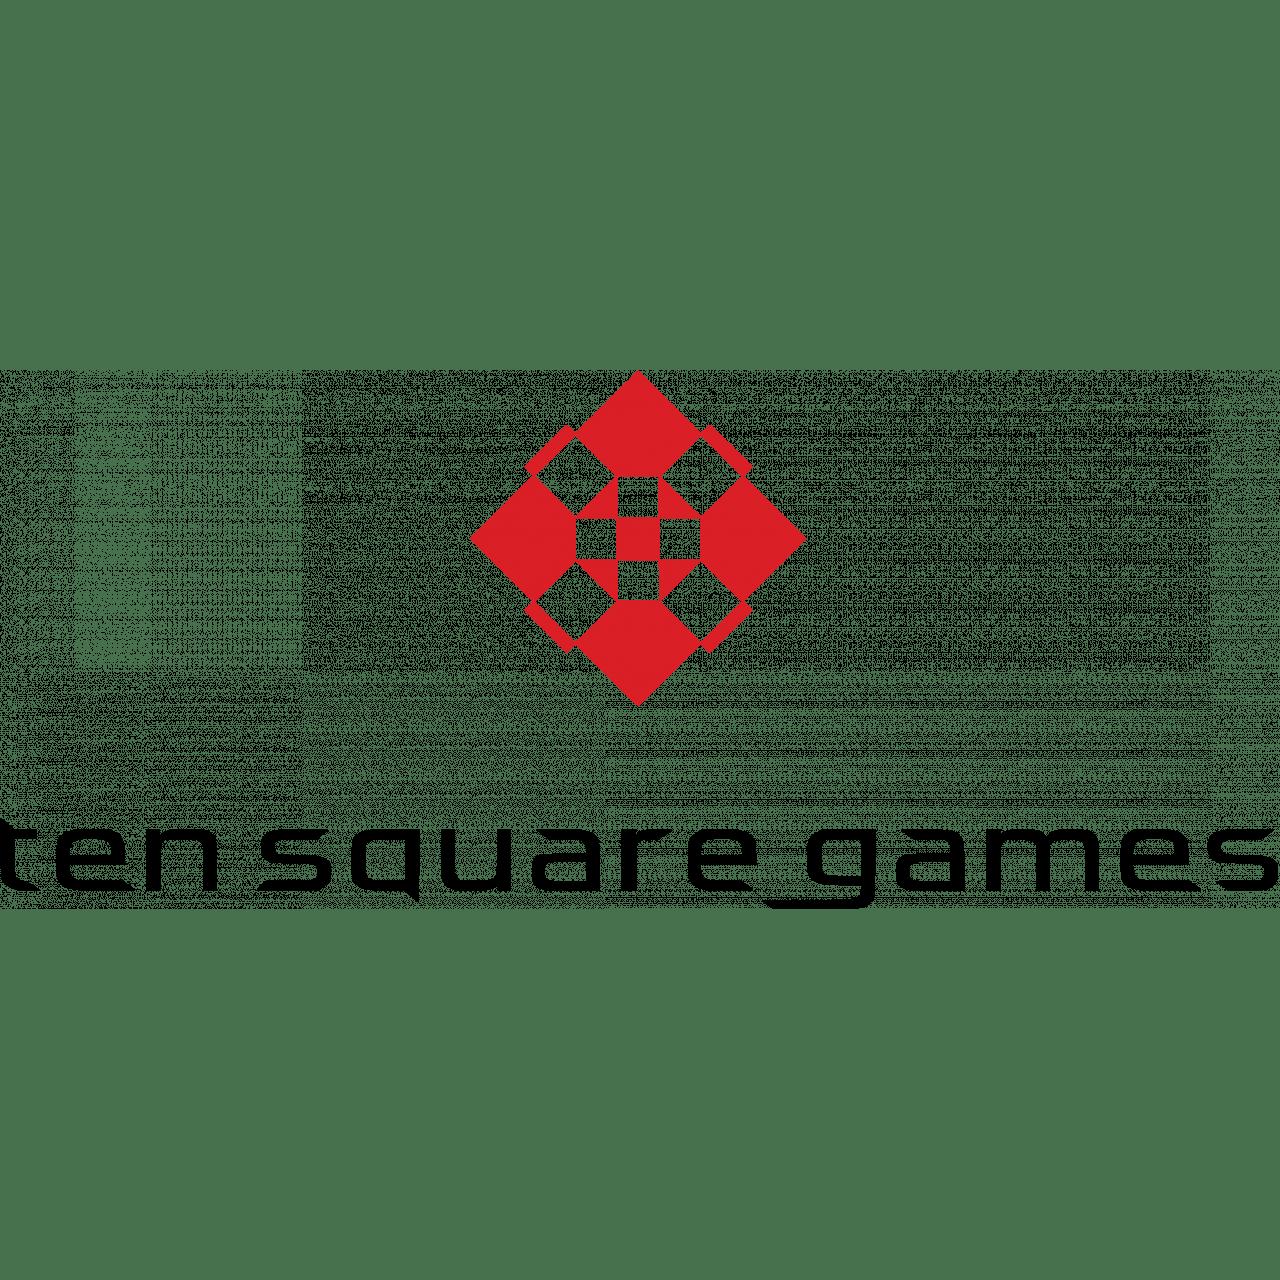 Ten Square Games | Fundamentale Aktienanalyse